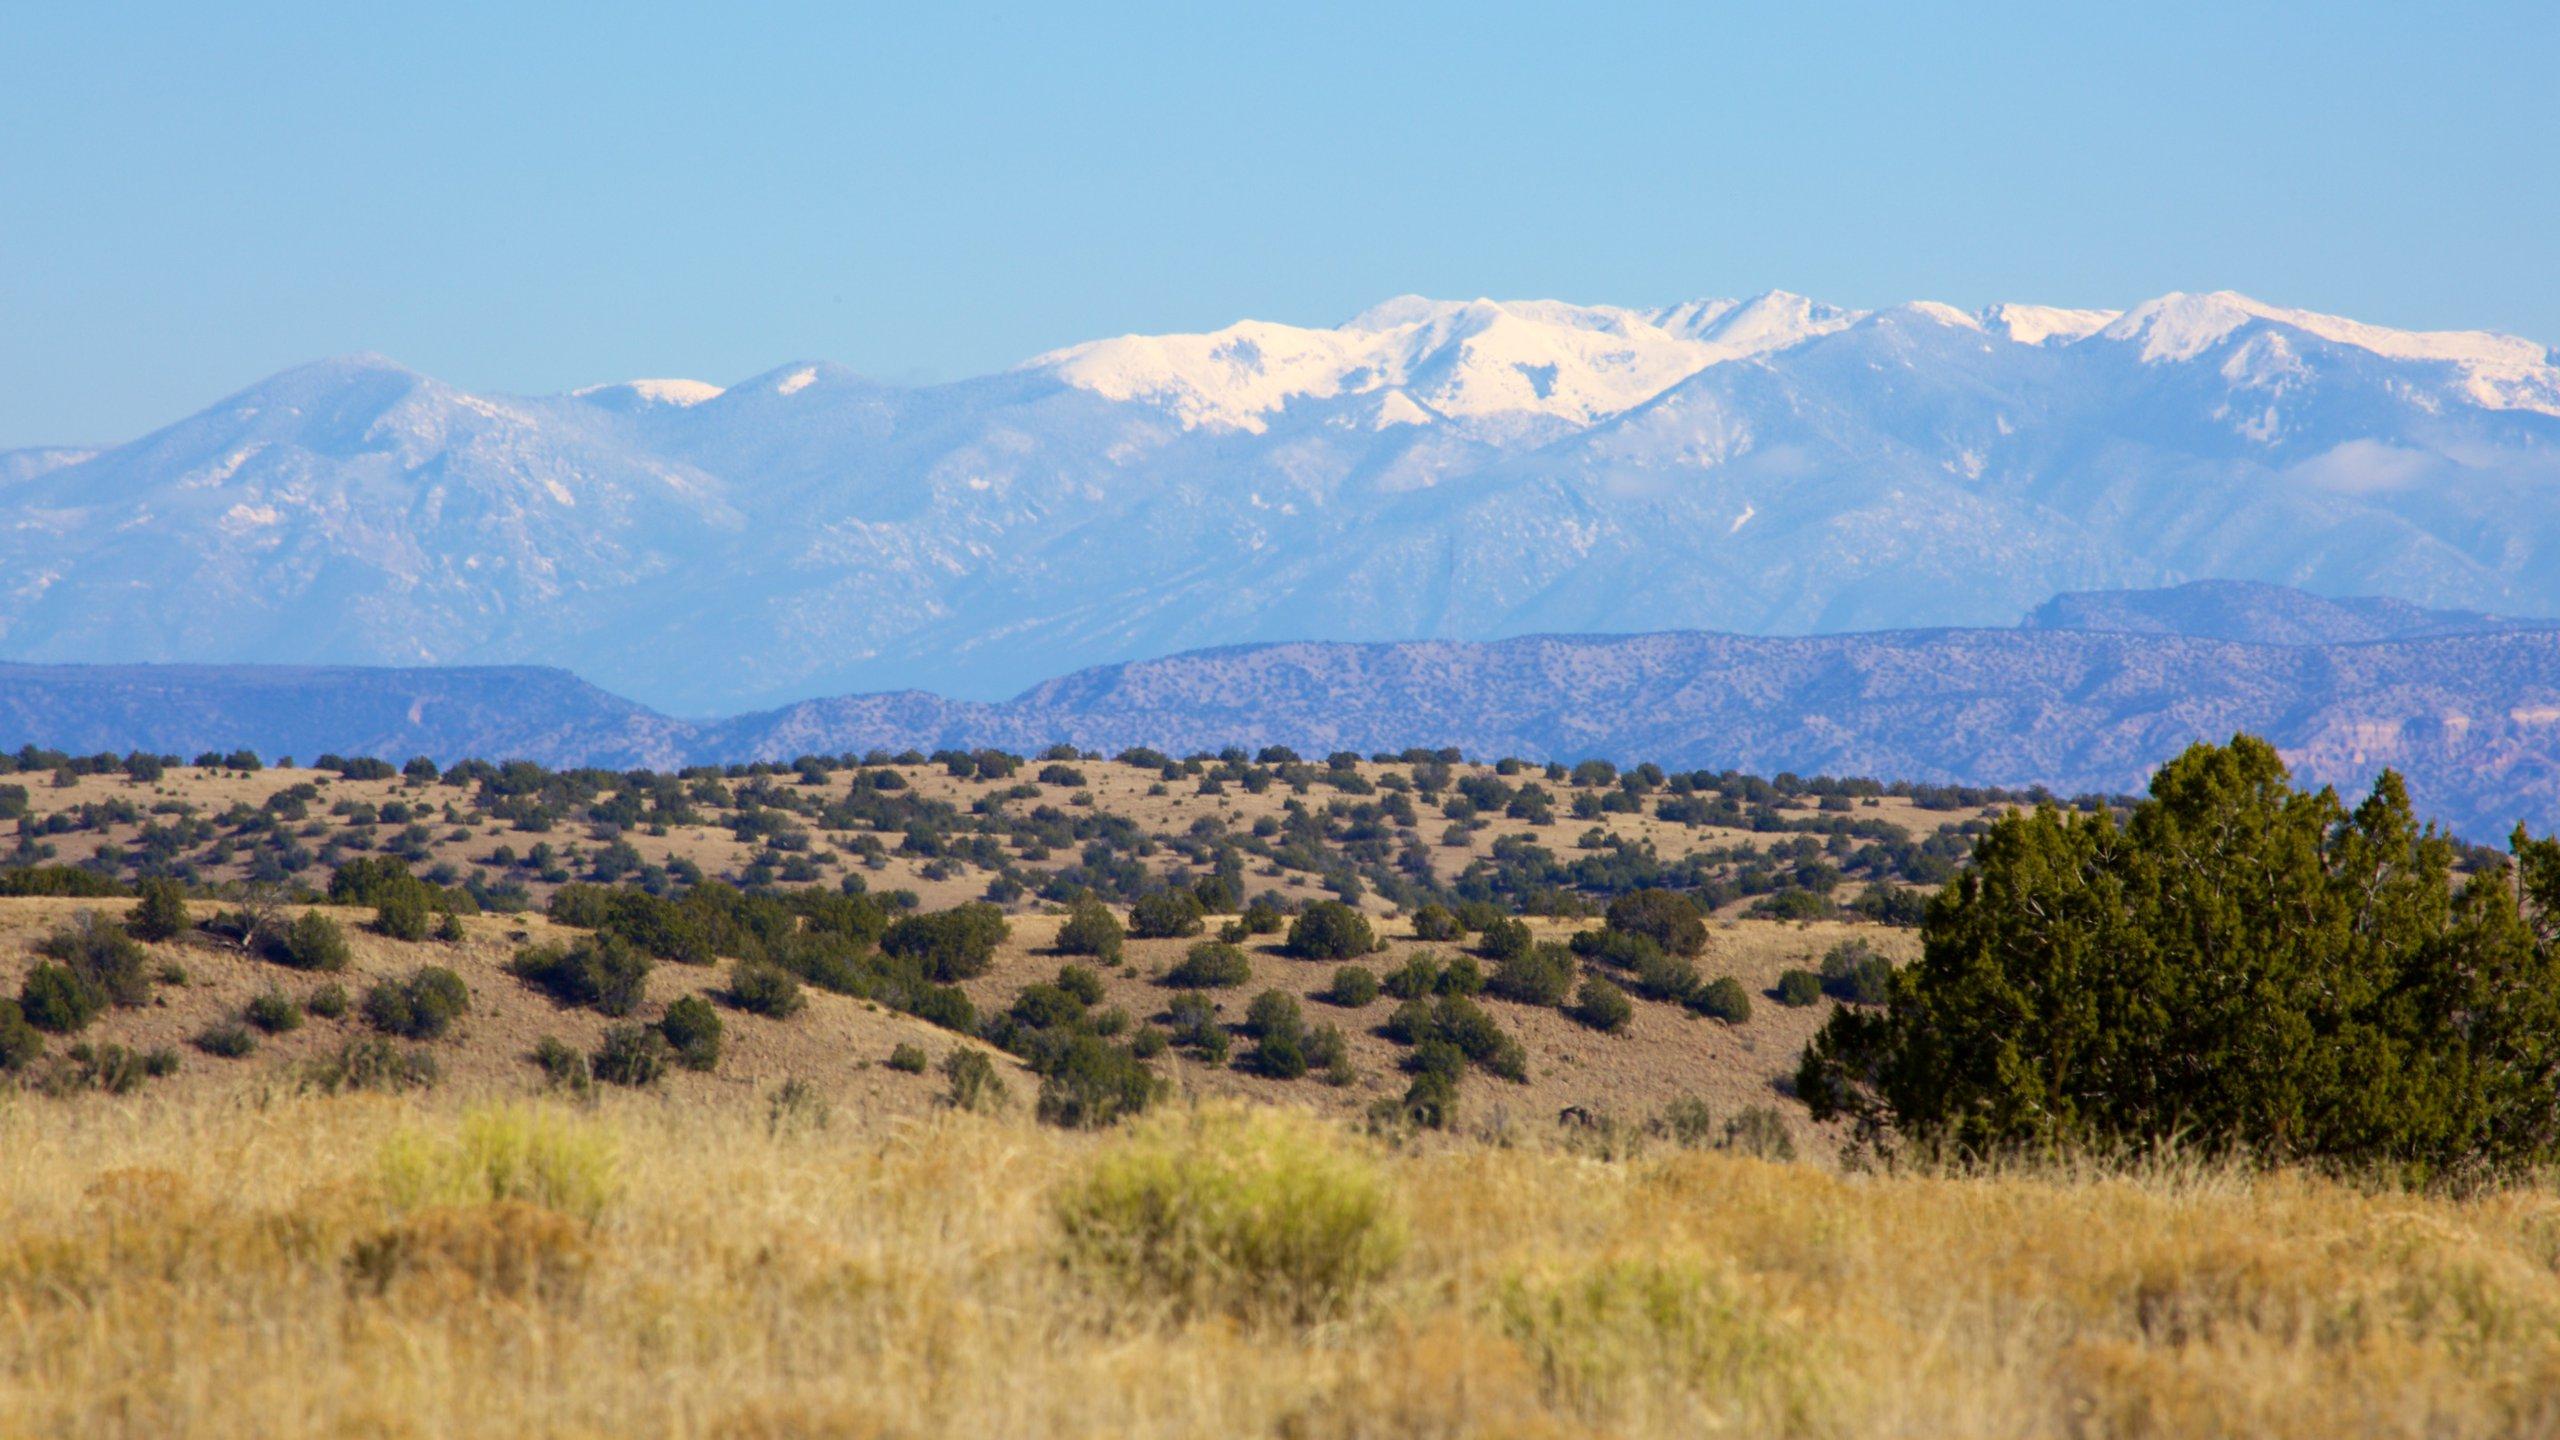 Rio Arriba County, New Mexico, United States of America